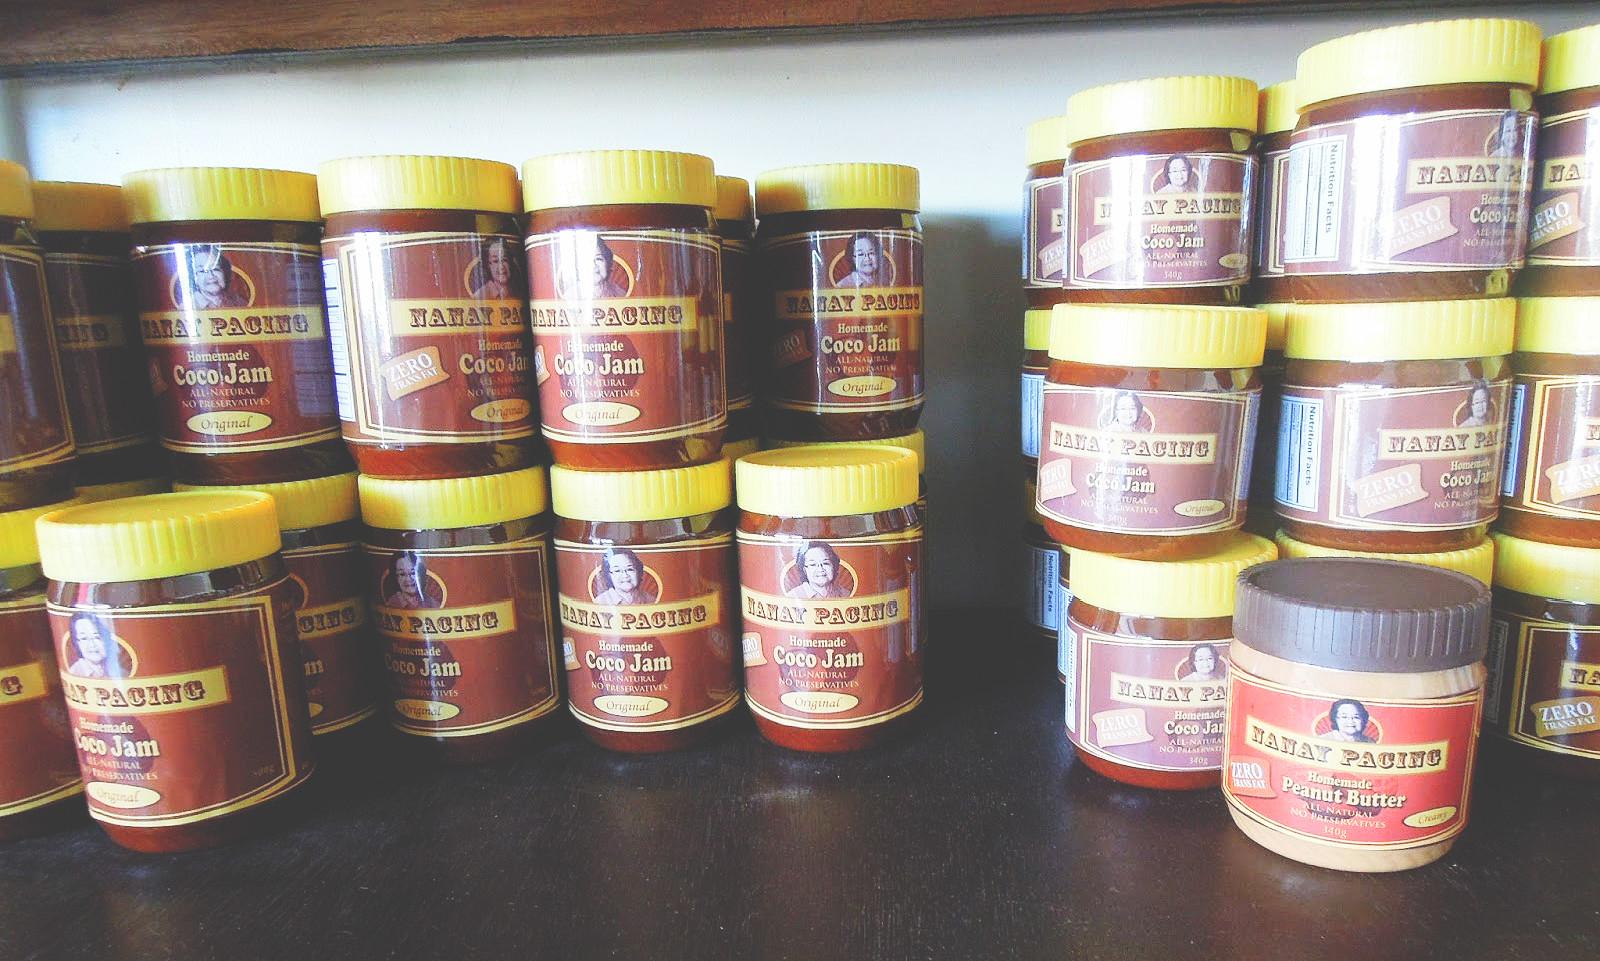 nanay-pacing-pasalubong-baler-coco-jam